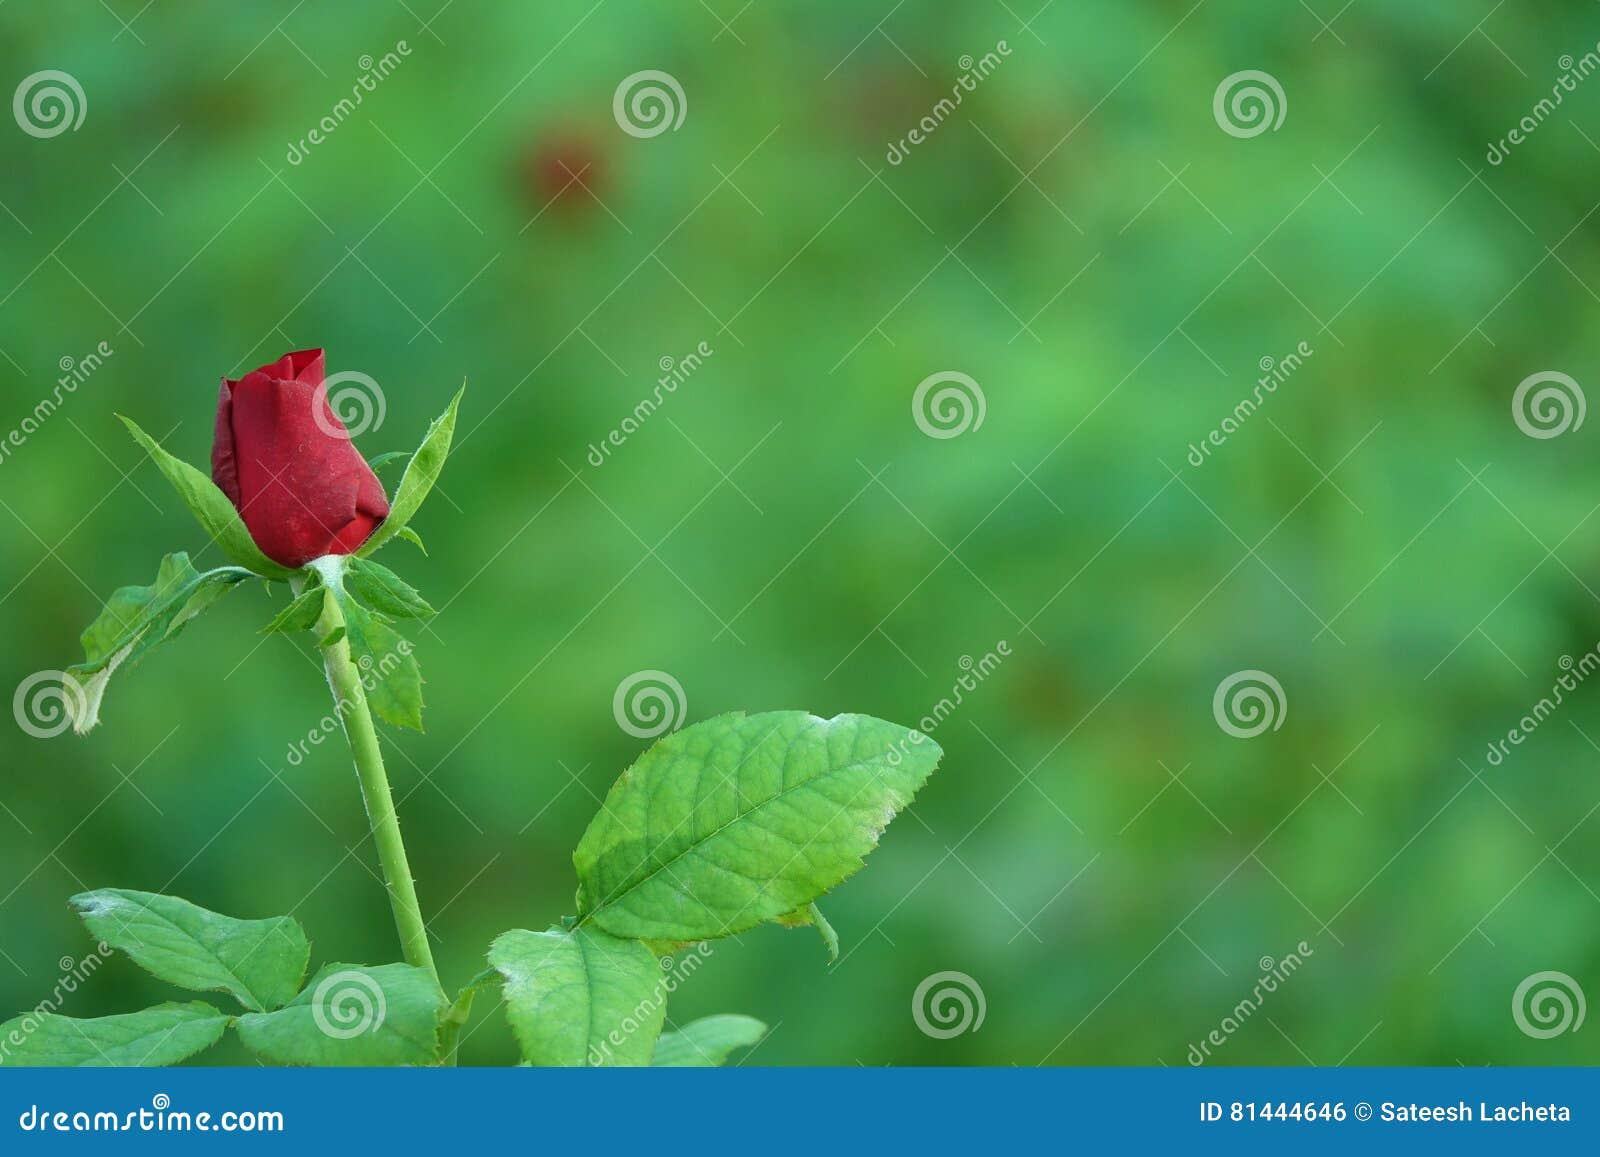 Schöne Rotrosenknospe